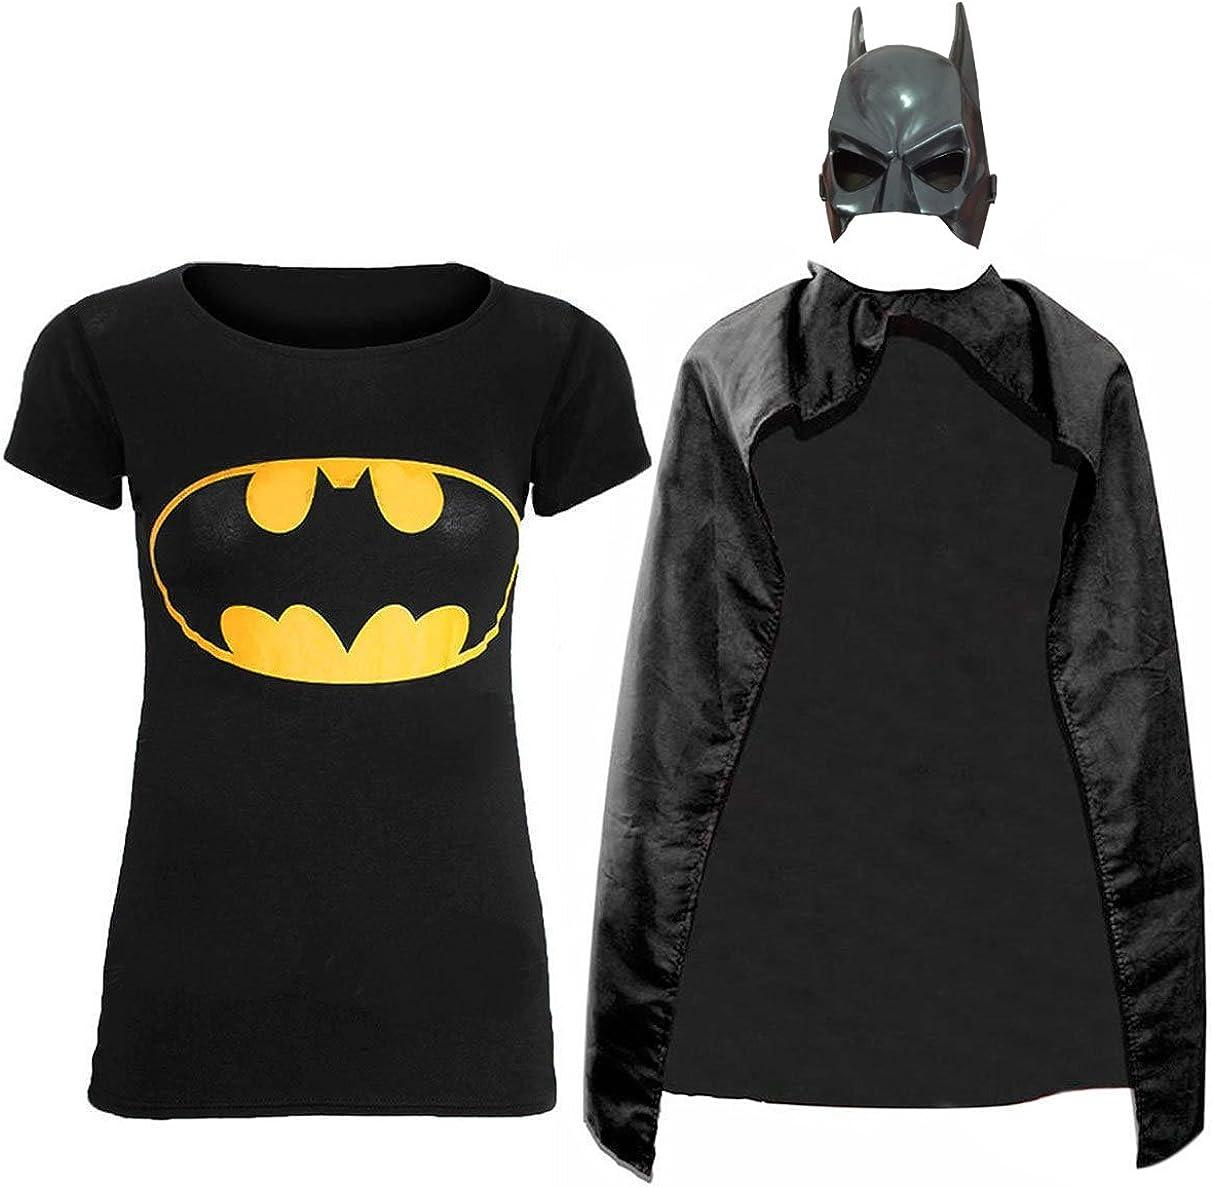 New Ladies manga corta Batman y Superman Camiseta Capa de ...